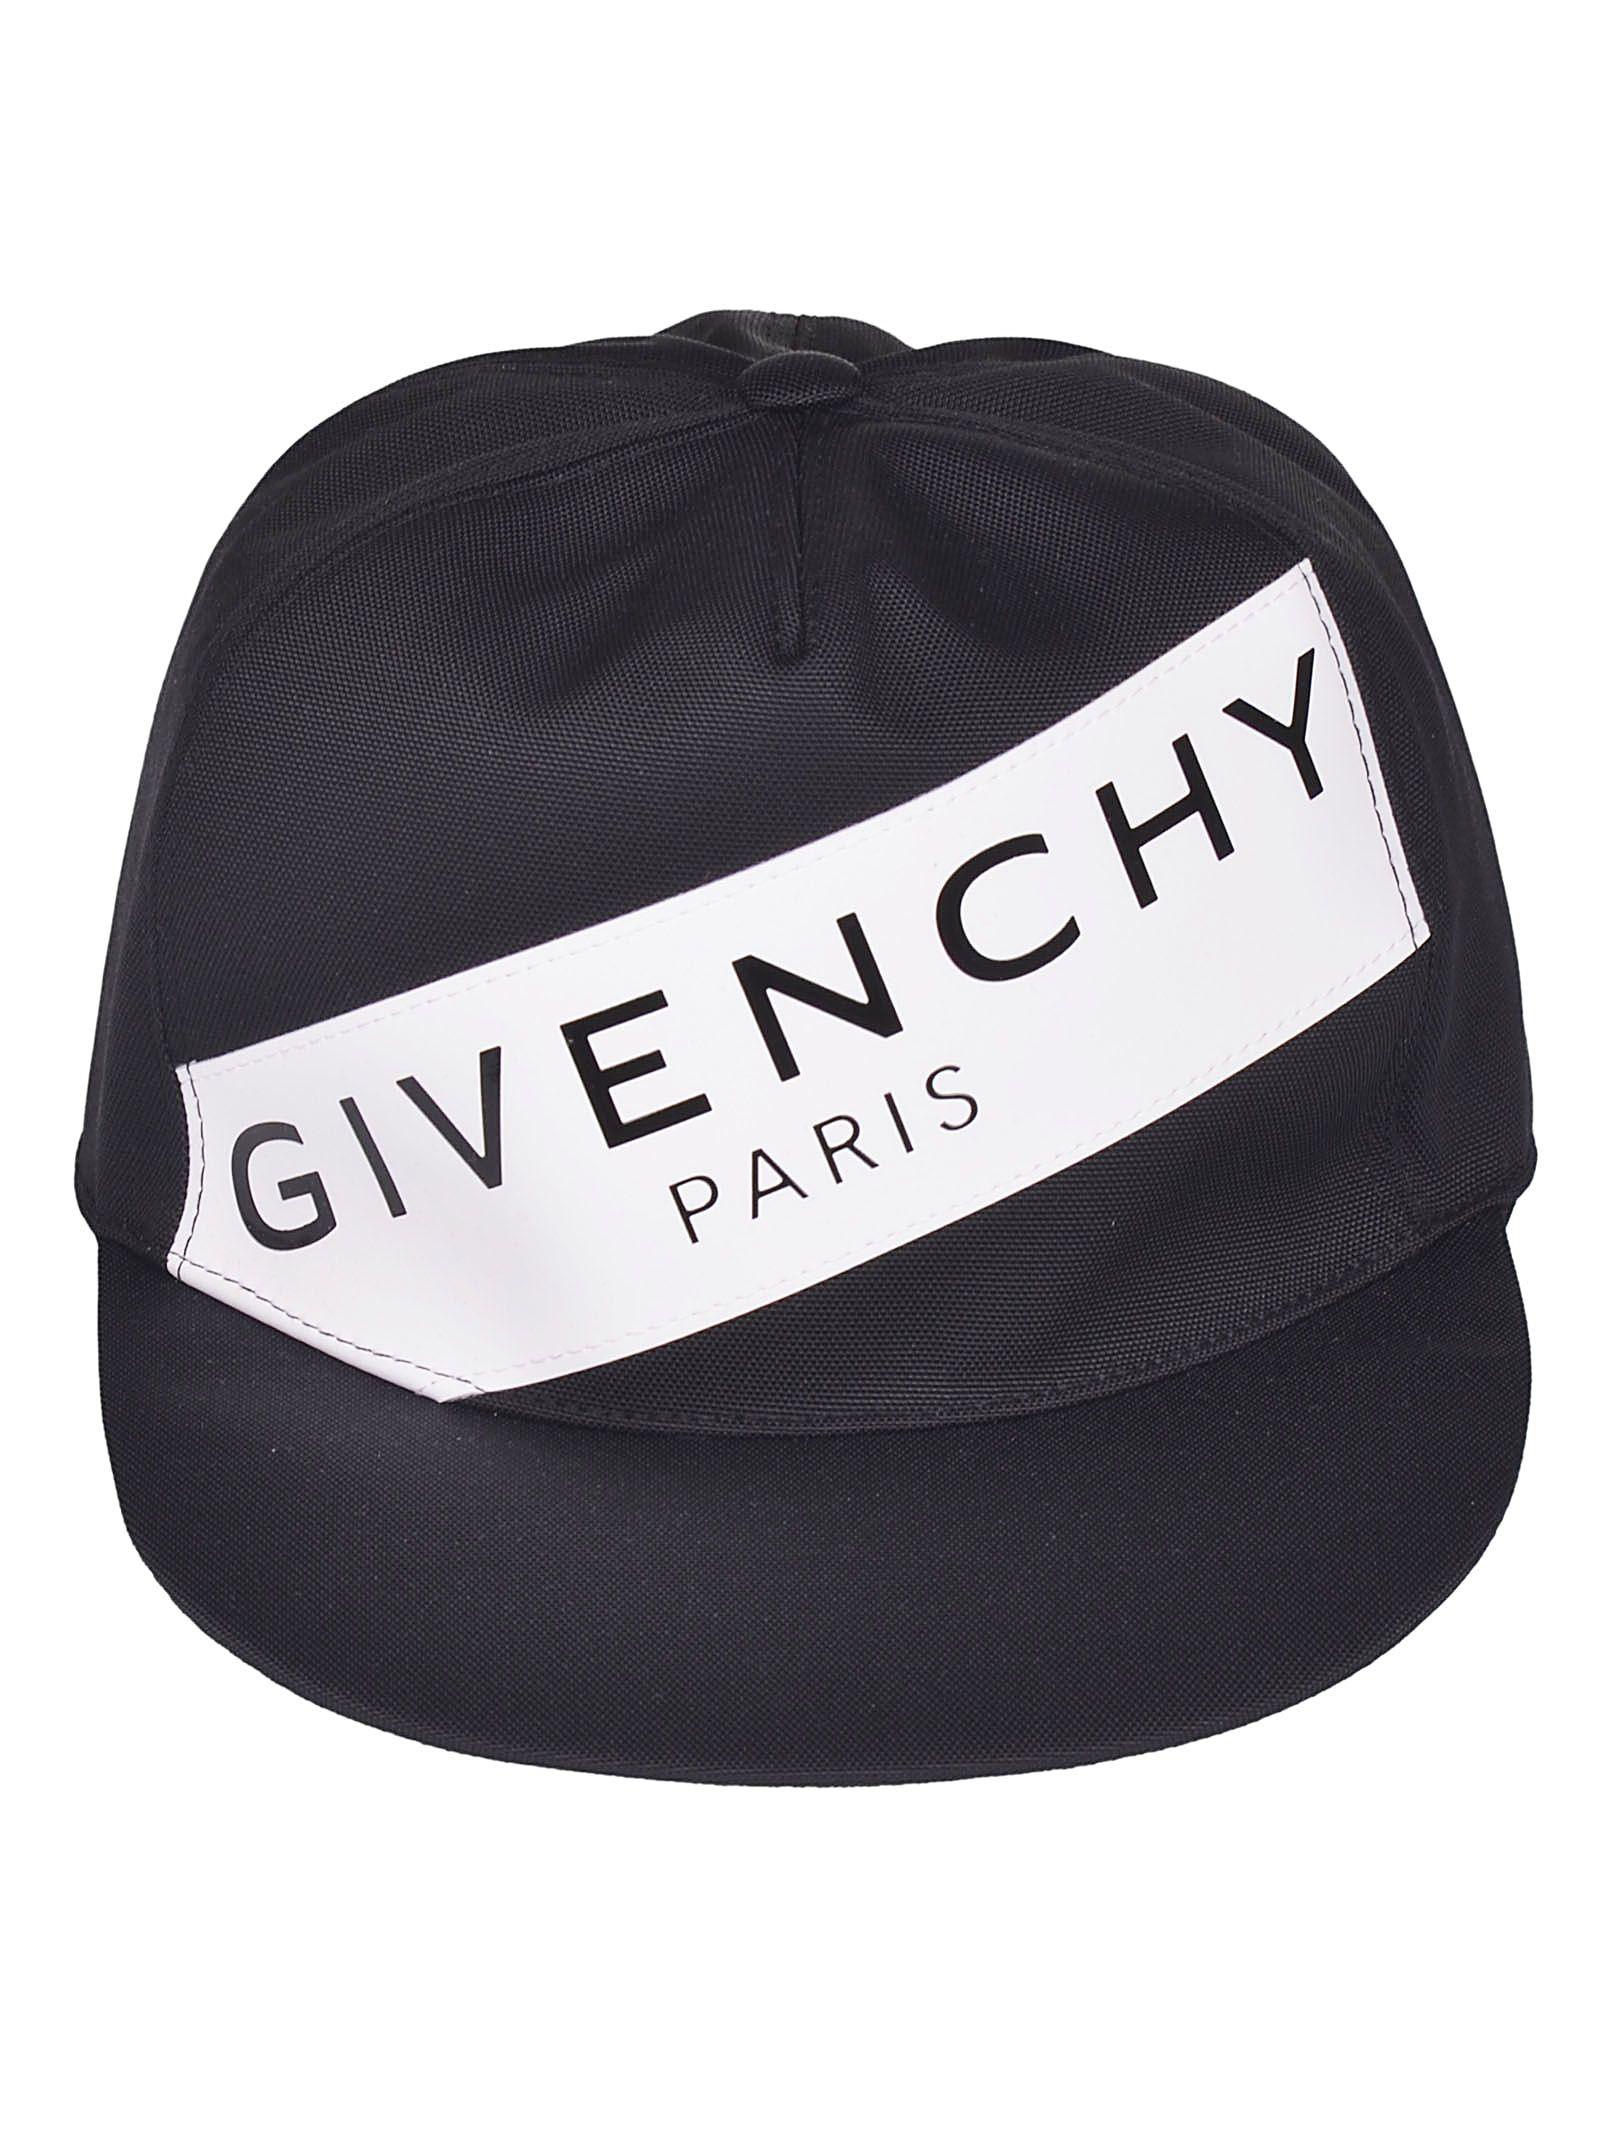 24a7c7772df Givenchy Givenchy Logo Cap - Black - 10851862